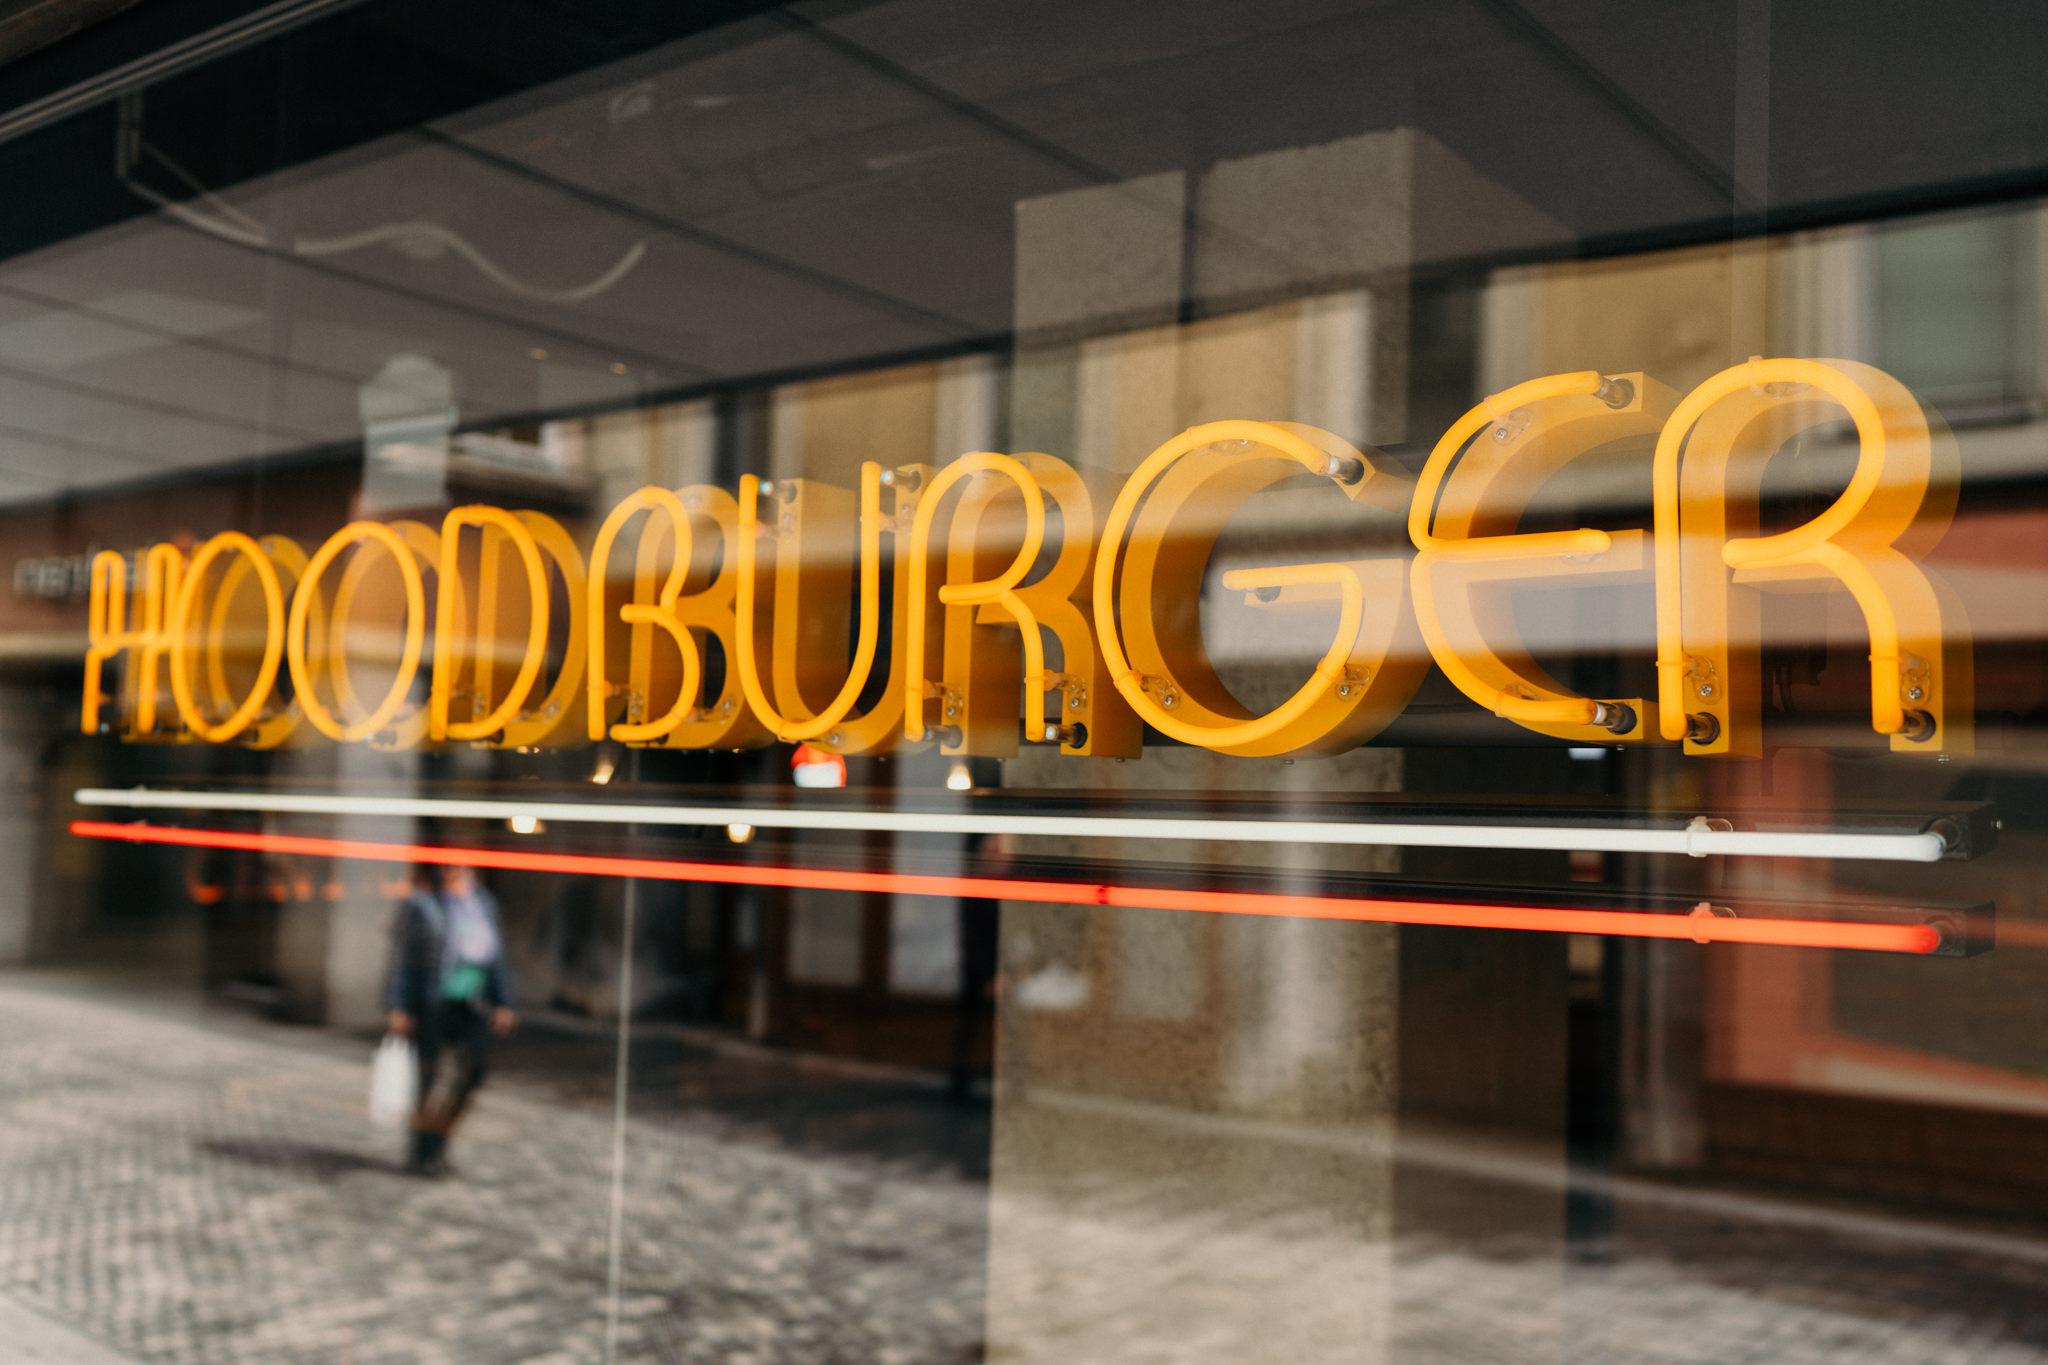 Hoodburger-1.jpg